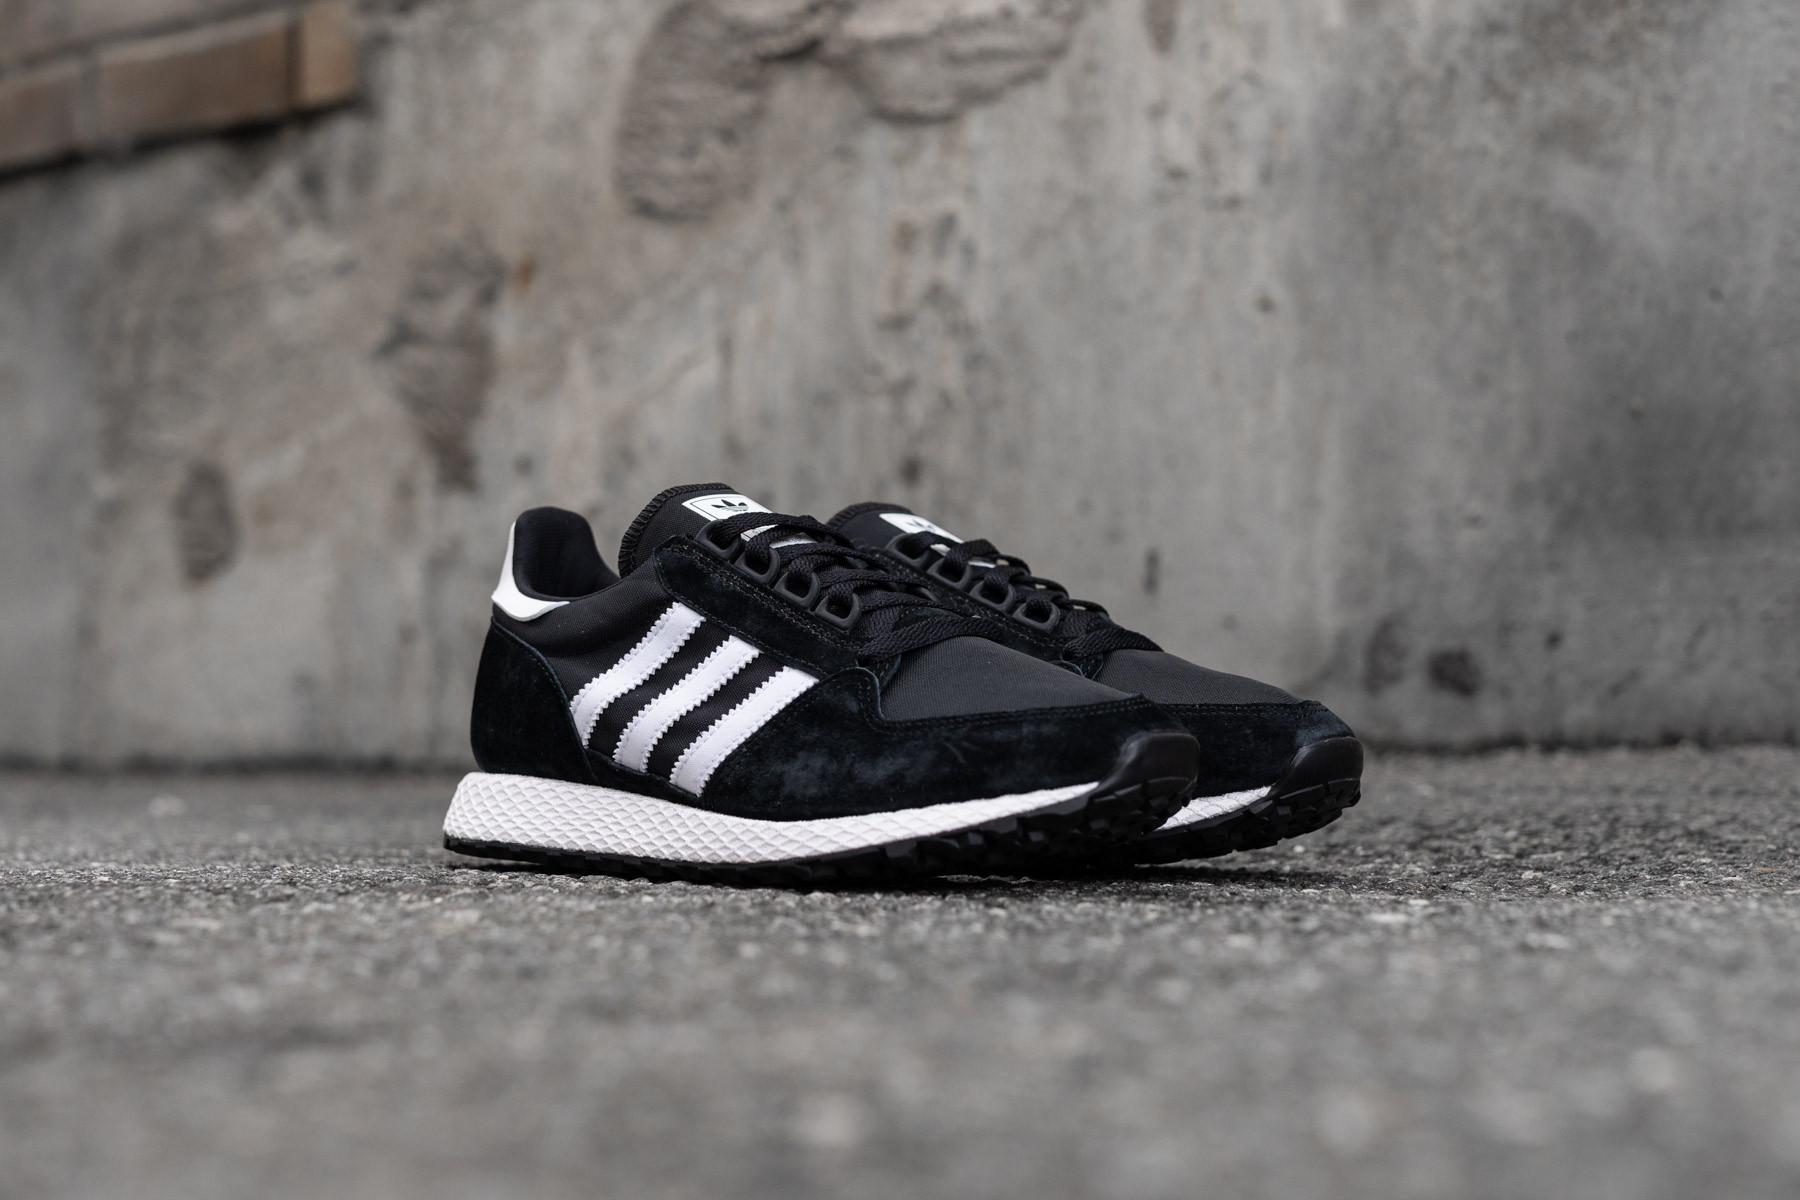 timeless design d960e ba61a W Adidas Forest Grove - Sneakers - Sneaker.no